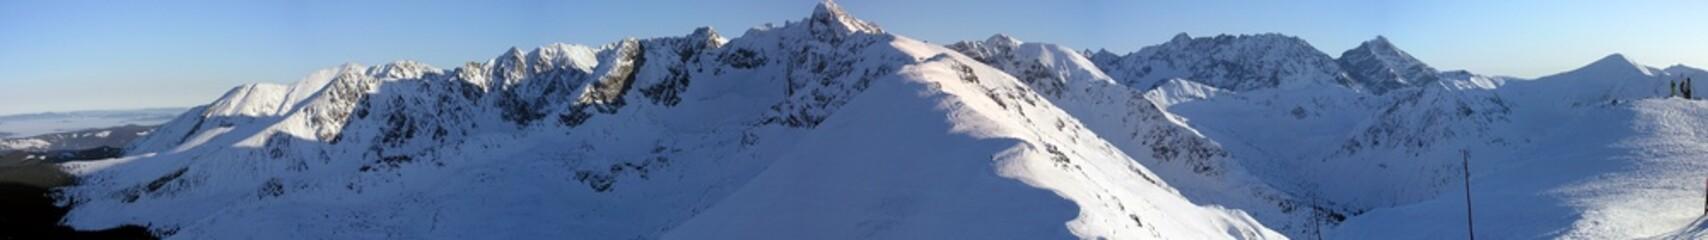 Beautiful winter high mountain landscape.